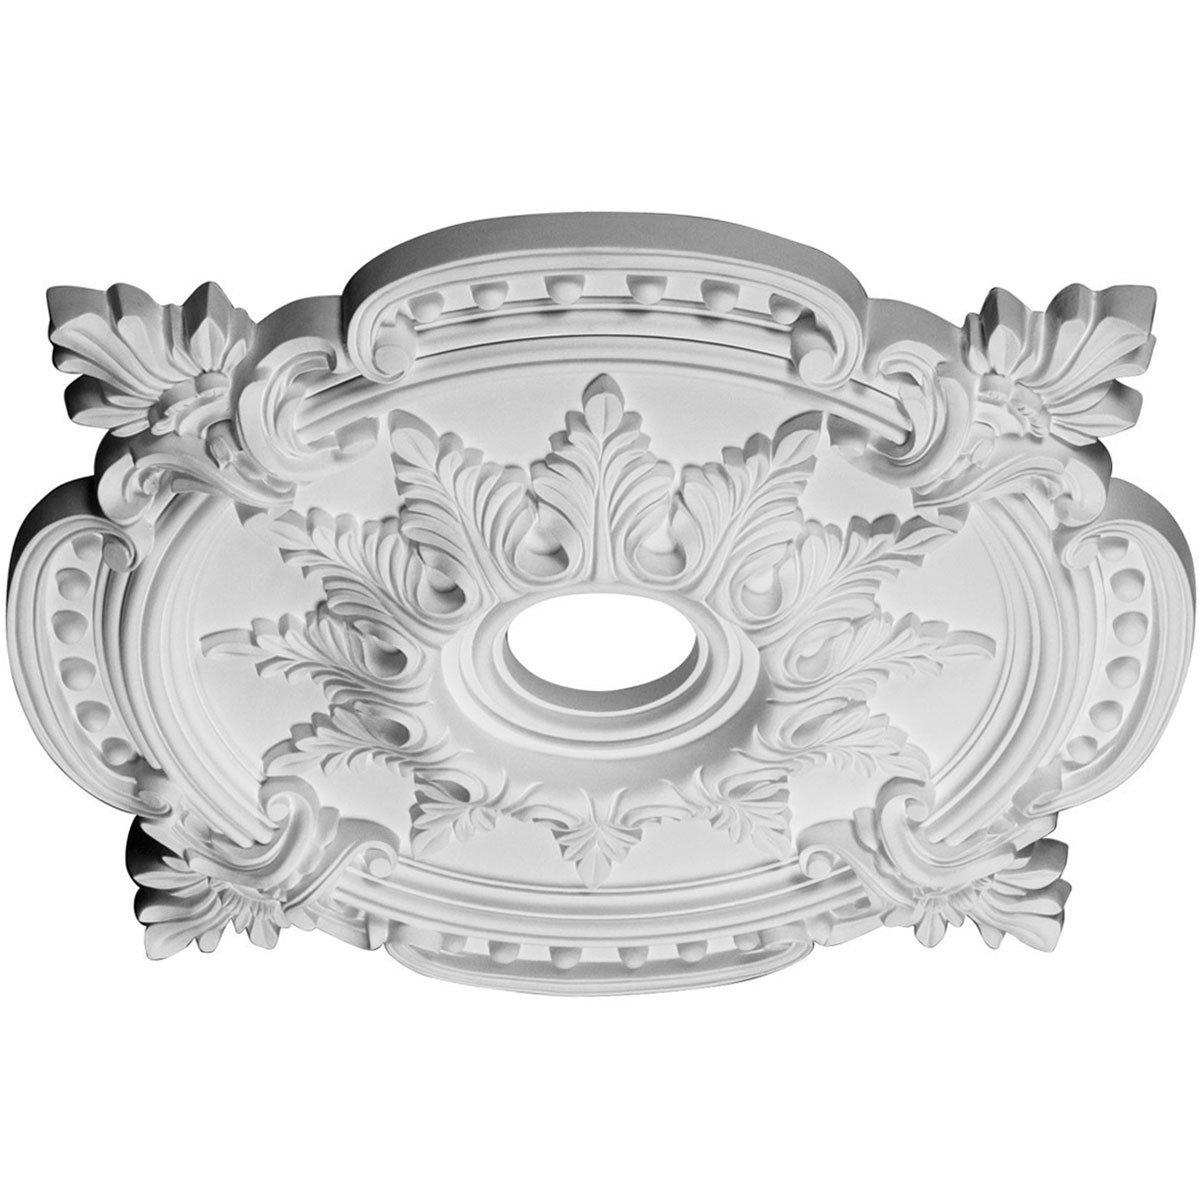 Ekena Millwork CM28BE 28 3/8-Inch OD x 4 1/2-Inch ID x 1 5/8-Inch P Benson Classic Ceiling Medallion by Ekena Millwork (Image #2)